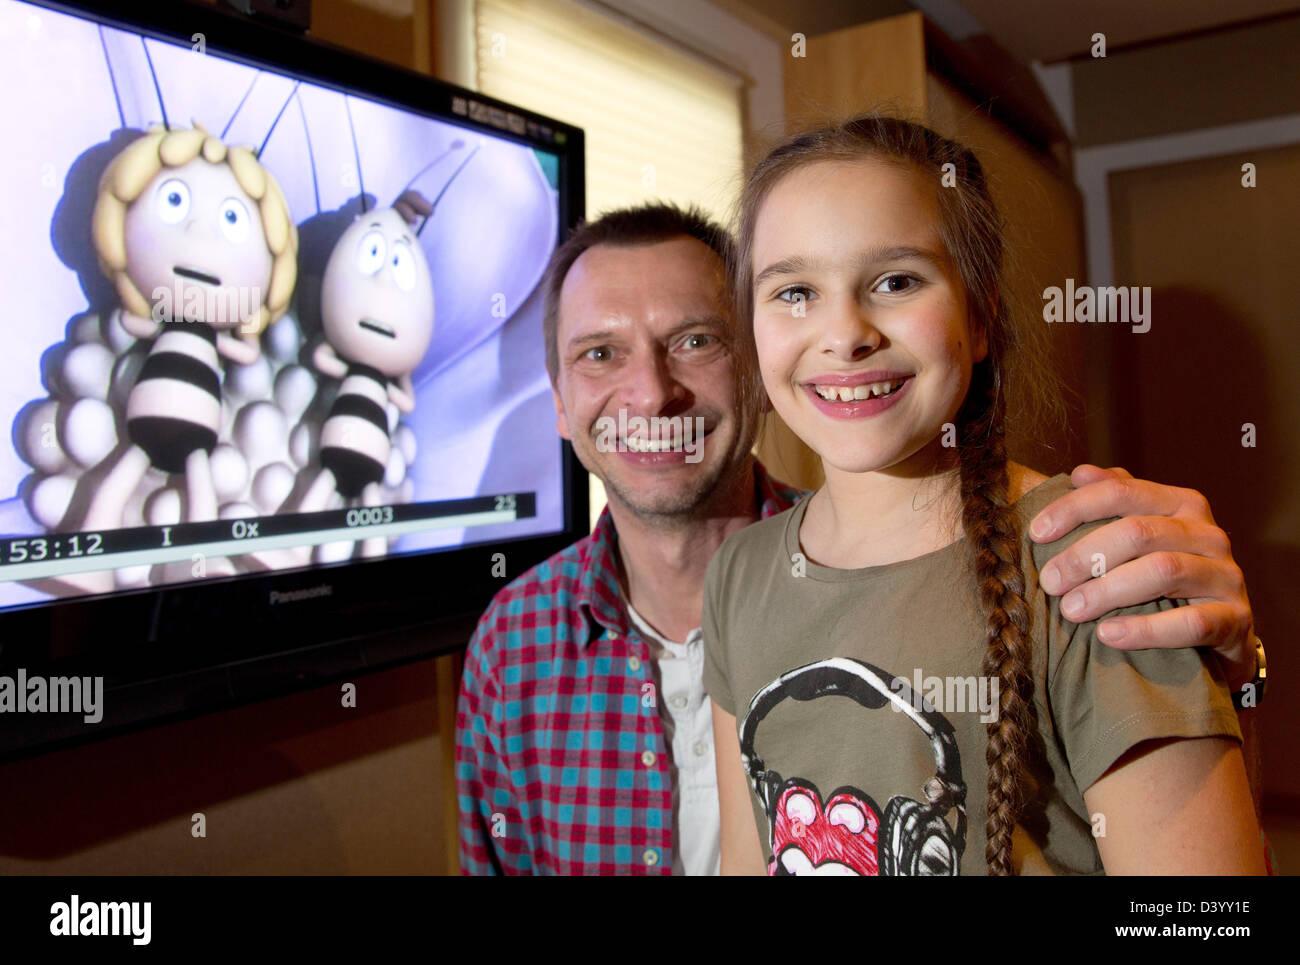 Voice actors Hans-Juergen Dittberner Zalina Sanchez (Maya the Bee) and Gerd Meyer (Willi) pose on the occasion of - Stock Image